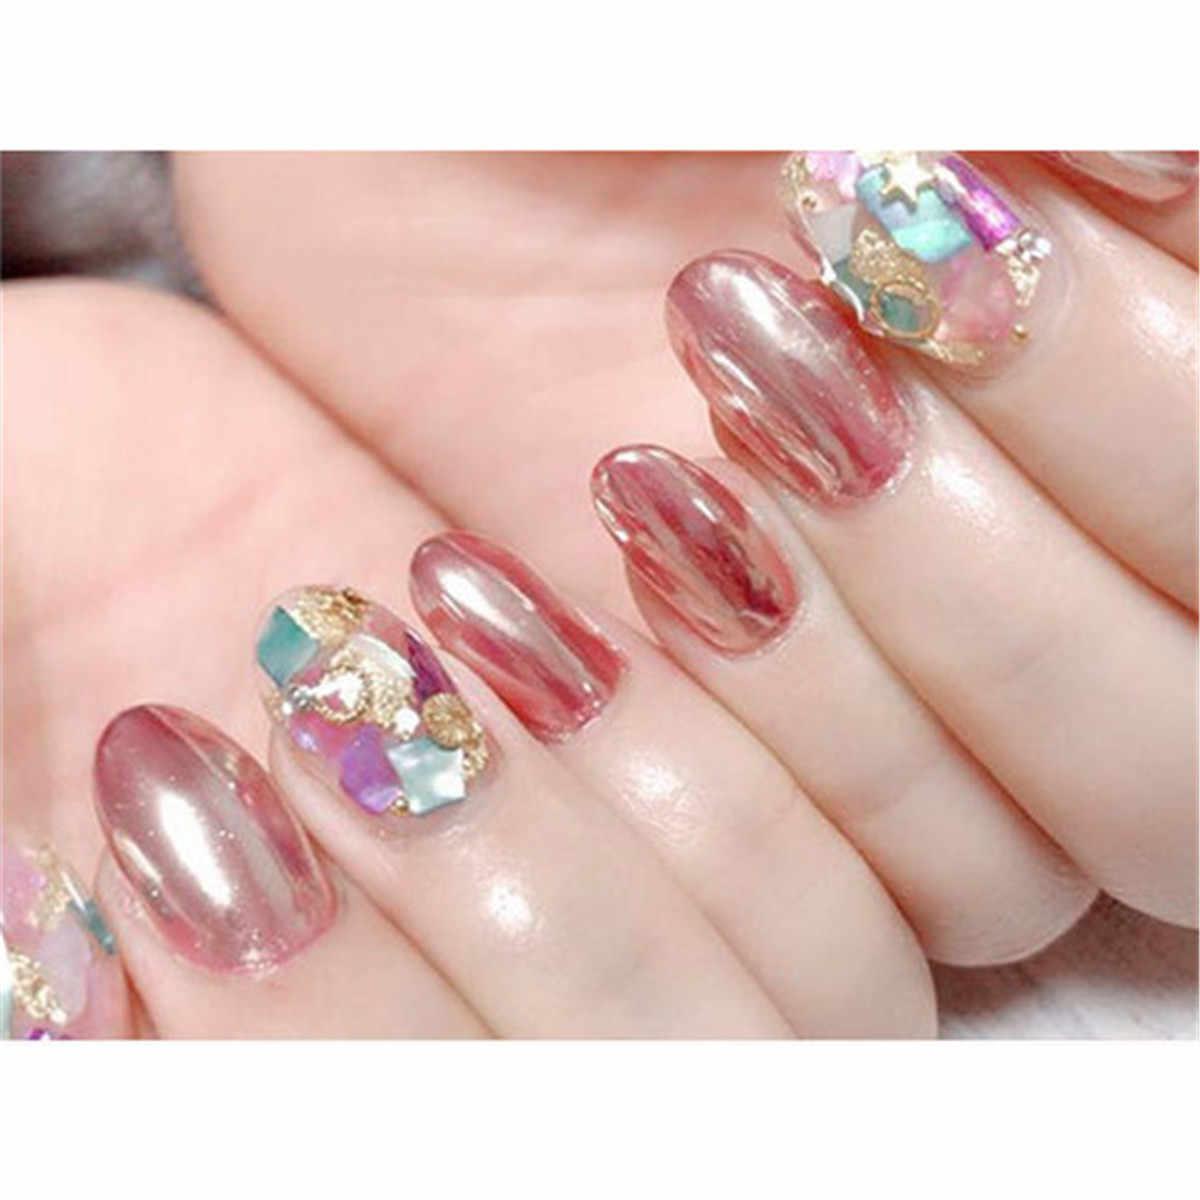 4c76243ba5 Rose Gold Nail Powder Metallic Nail Art Sparkles Glitter Dust Mirror  Pigment Ultra Thin Chrome Elegant for Manicure Makeup Tools